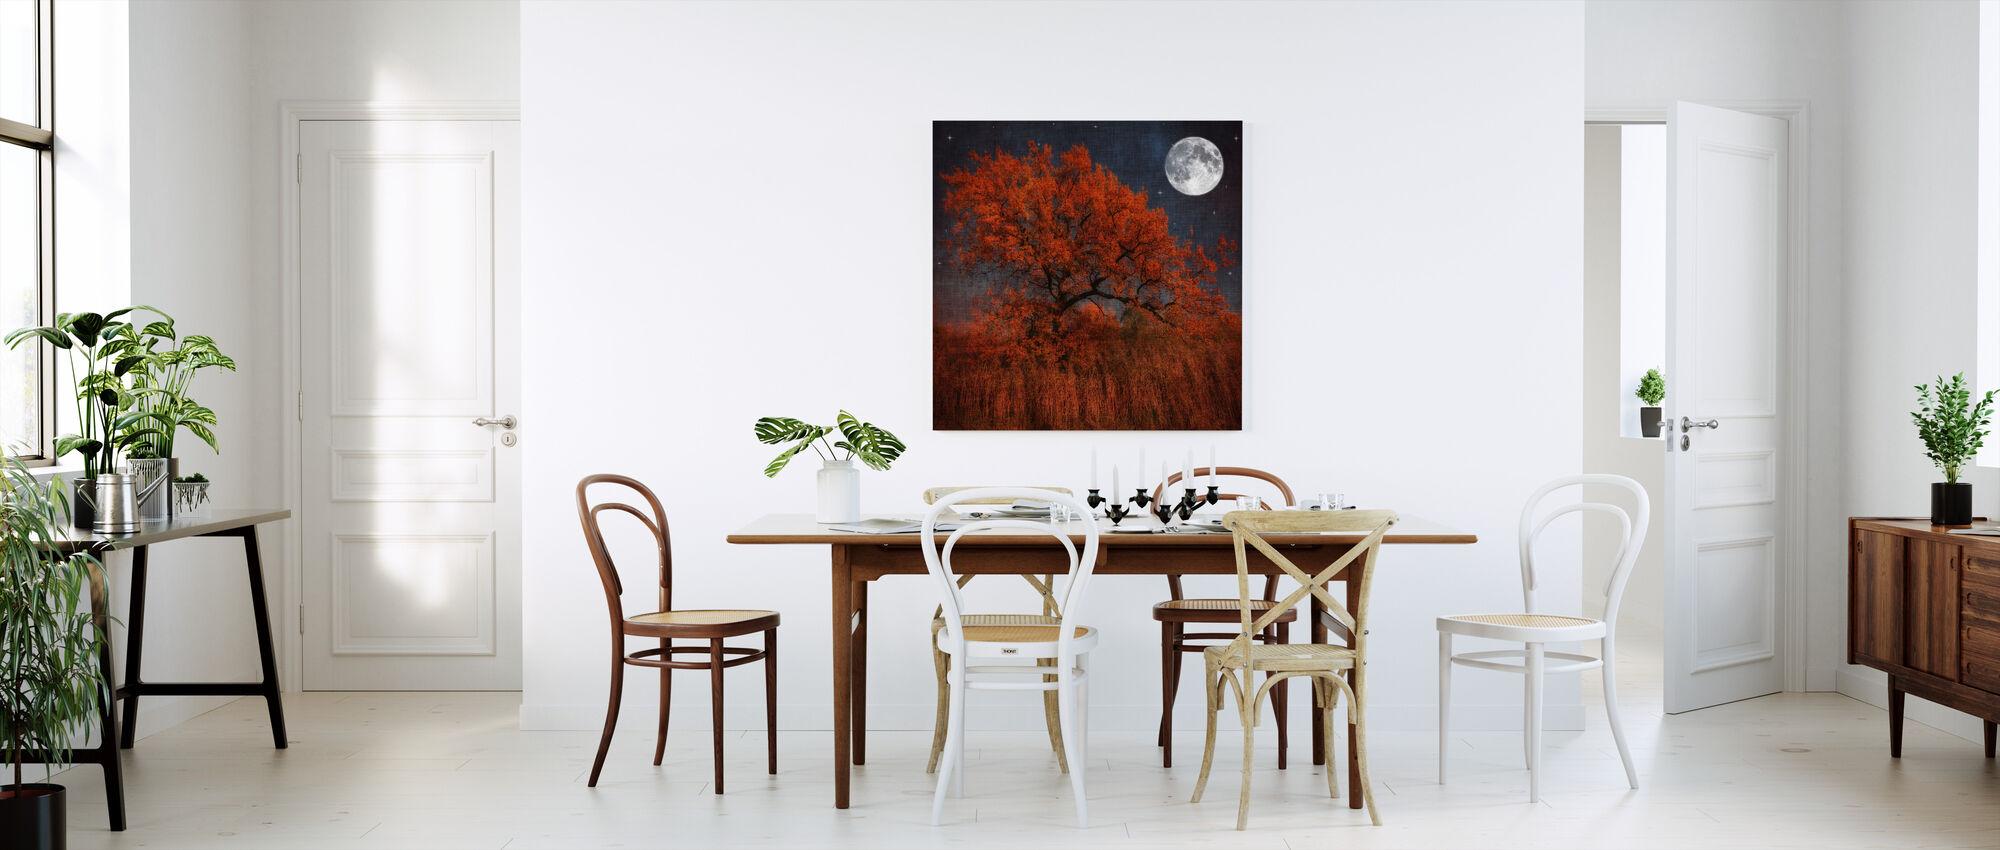 Halloween Puu - Canvastaulu - Keittiö